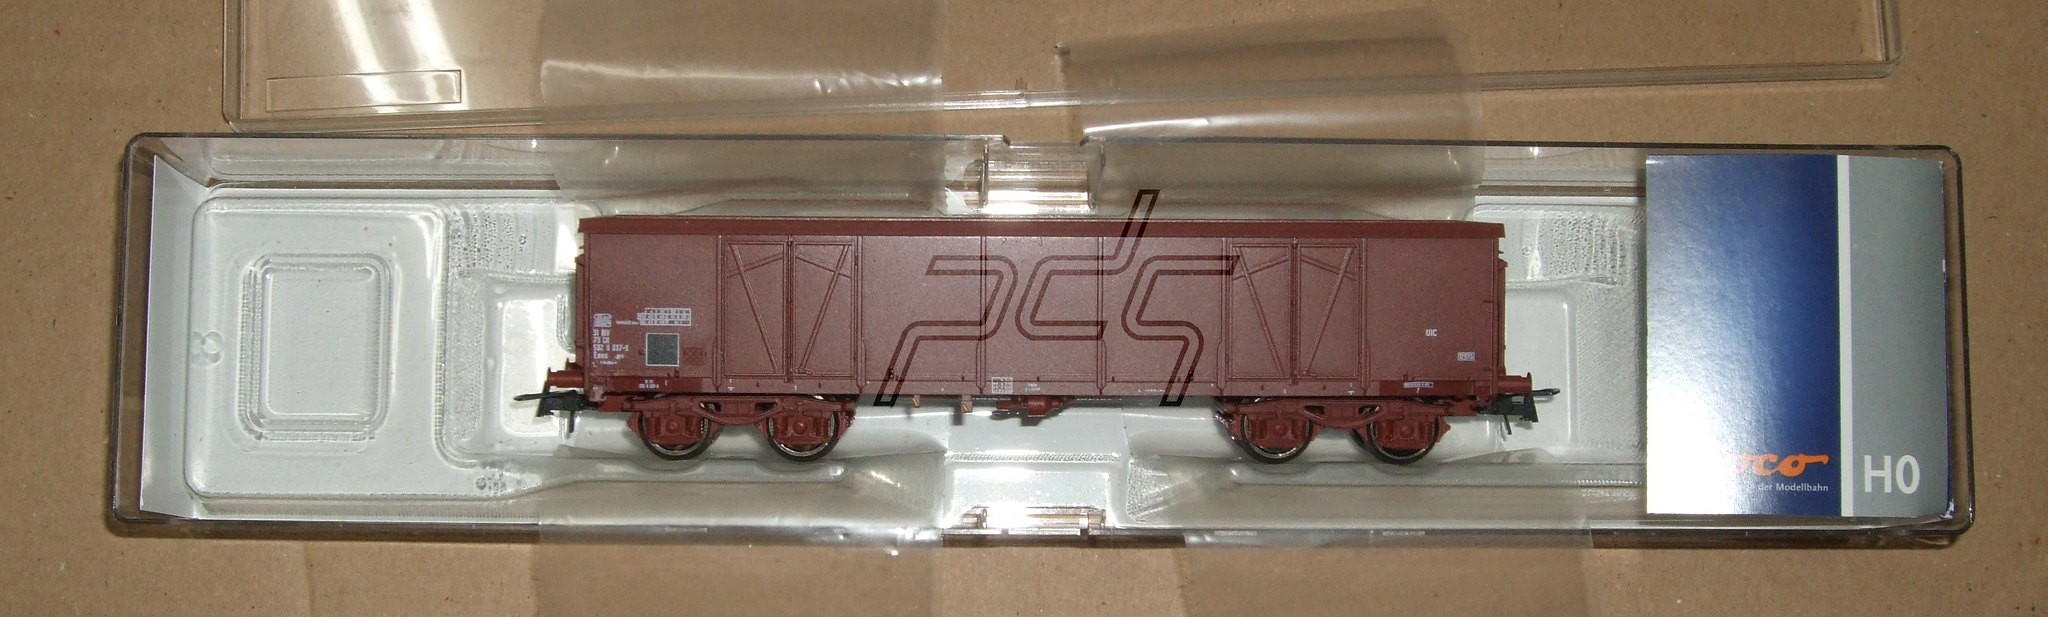 BALKANMODELS FORUM • View topic - PDS: greek model railway